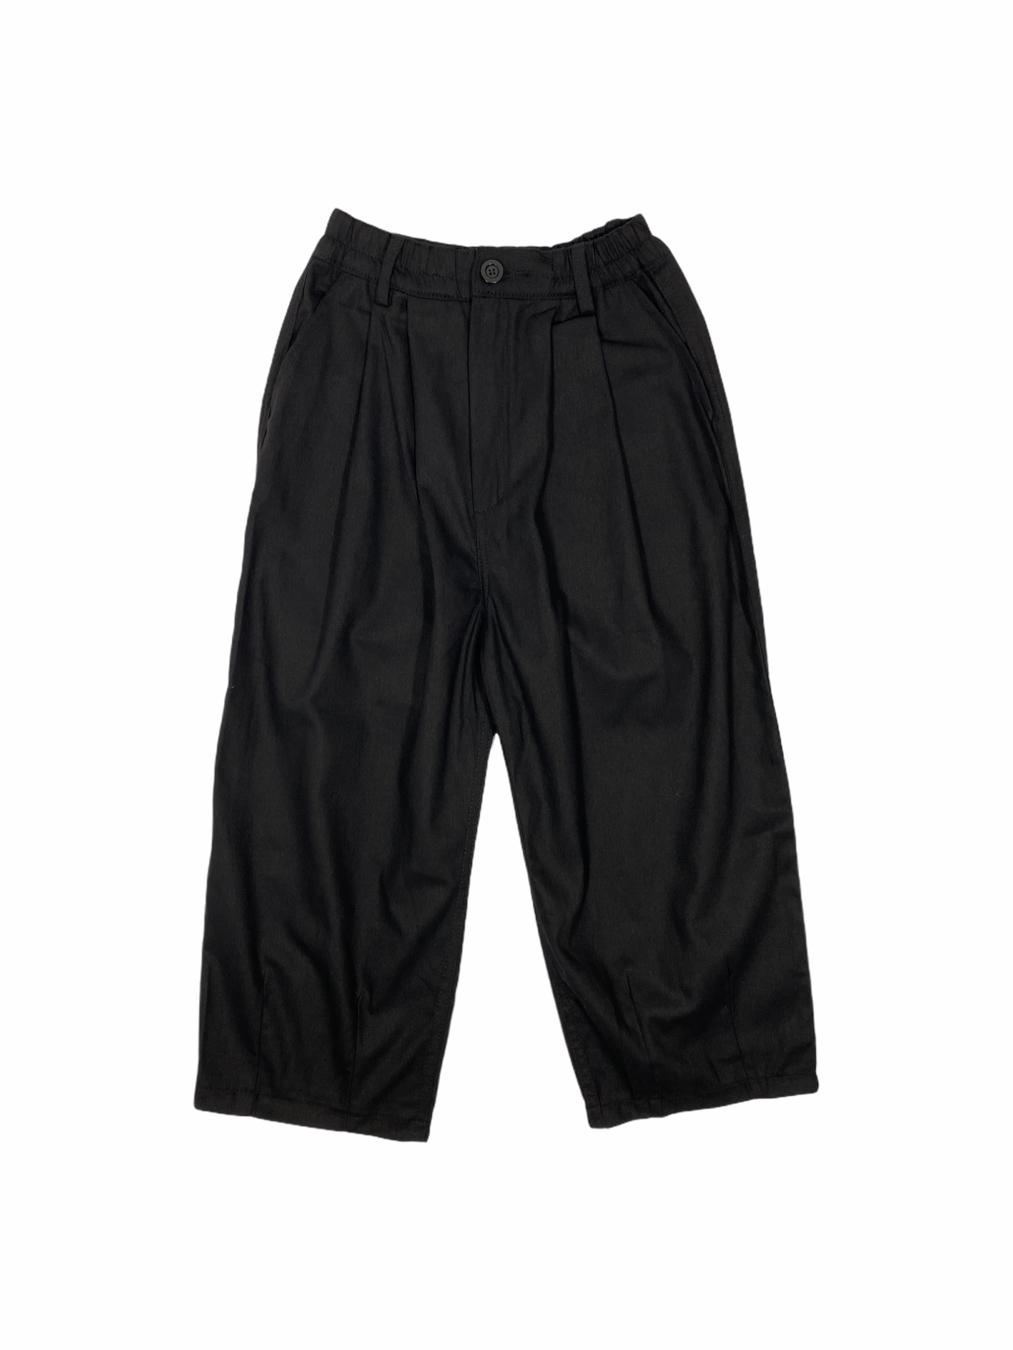 Balloon Pants (Black)